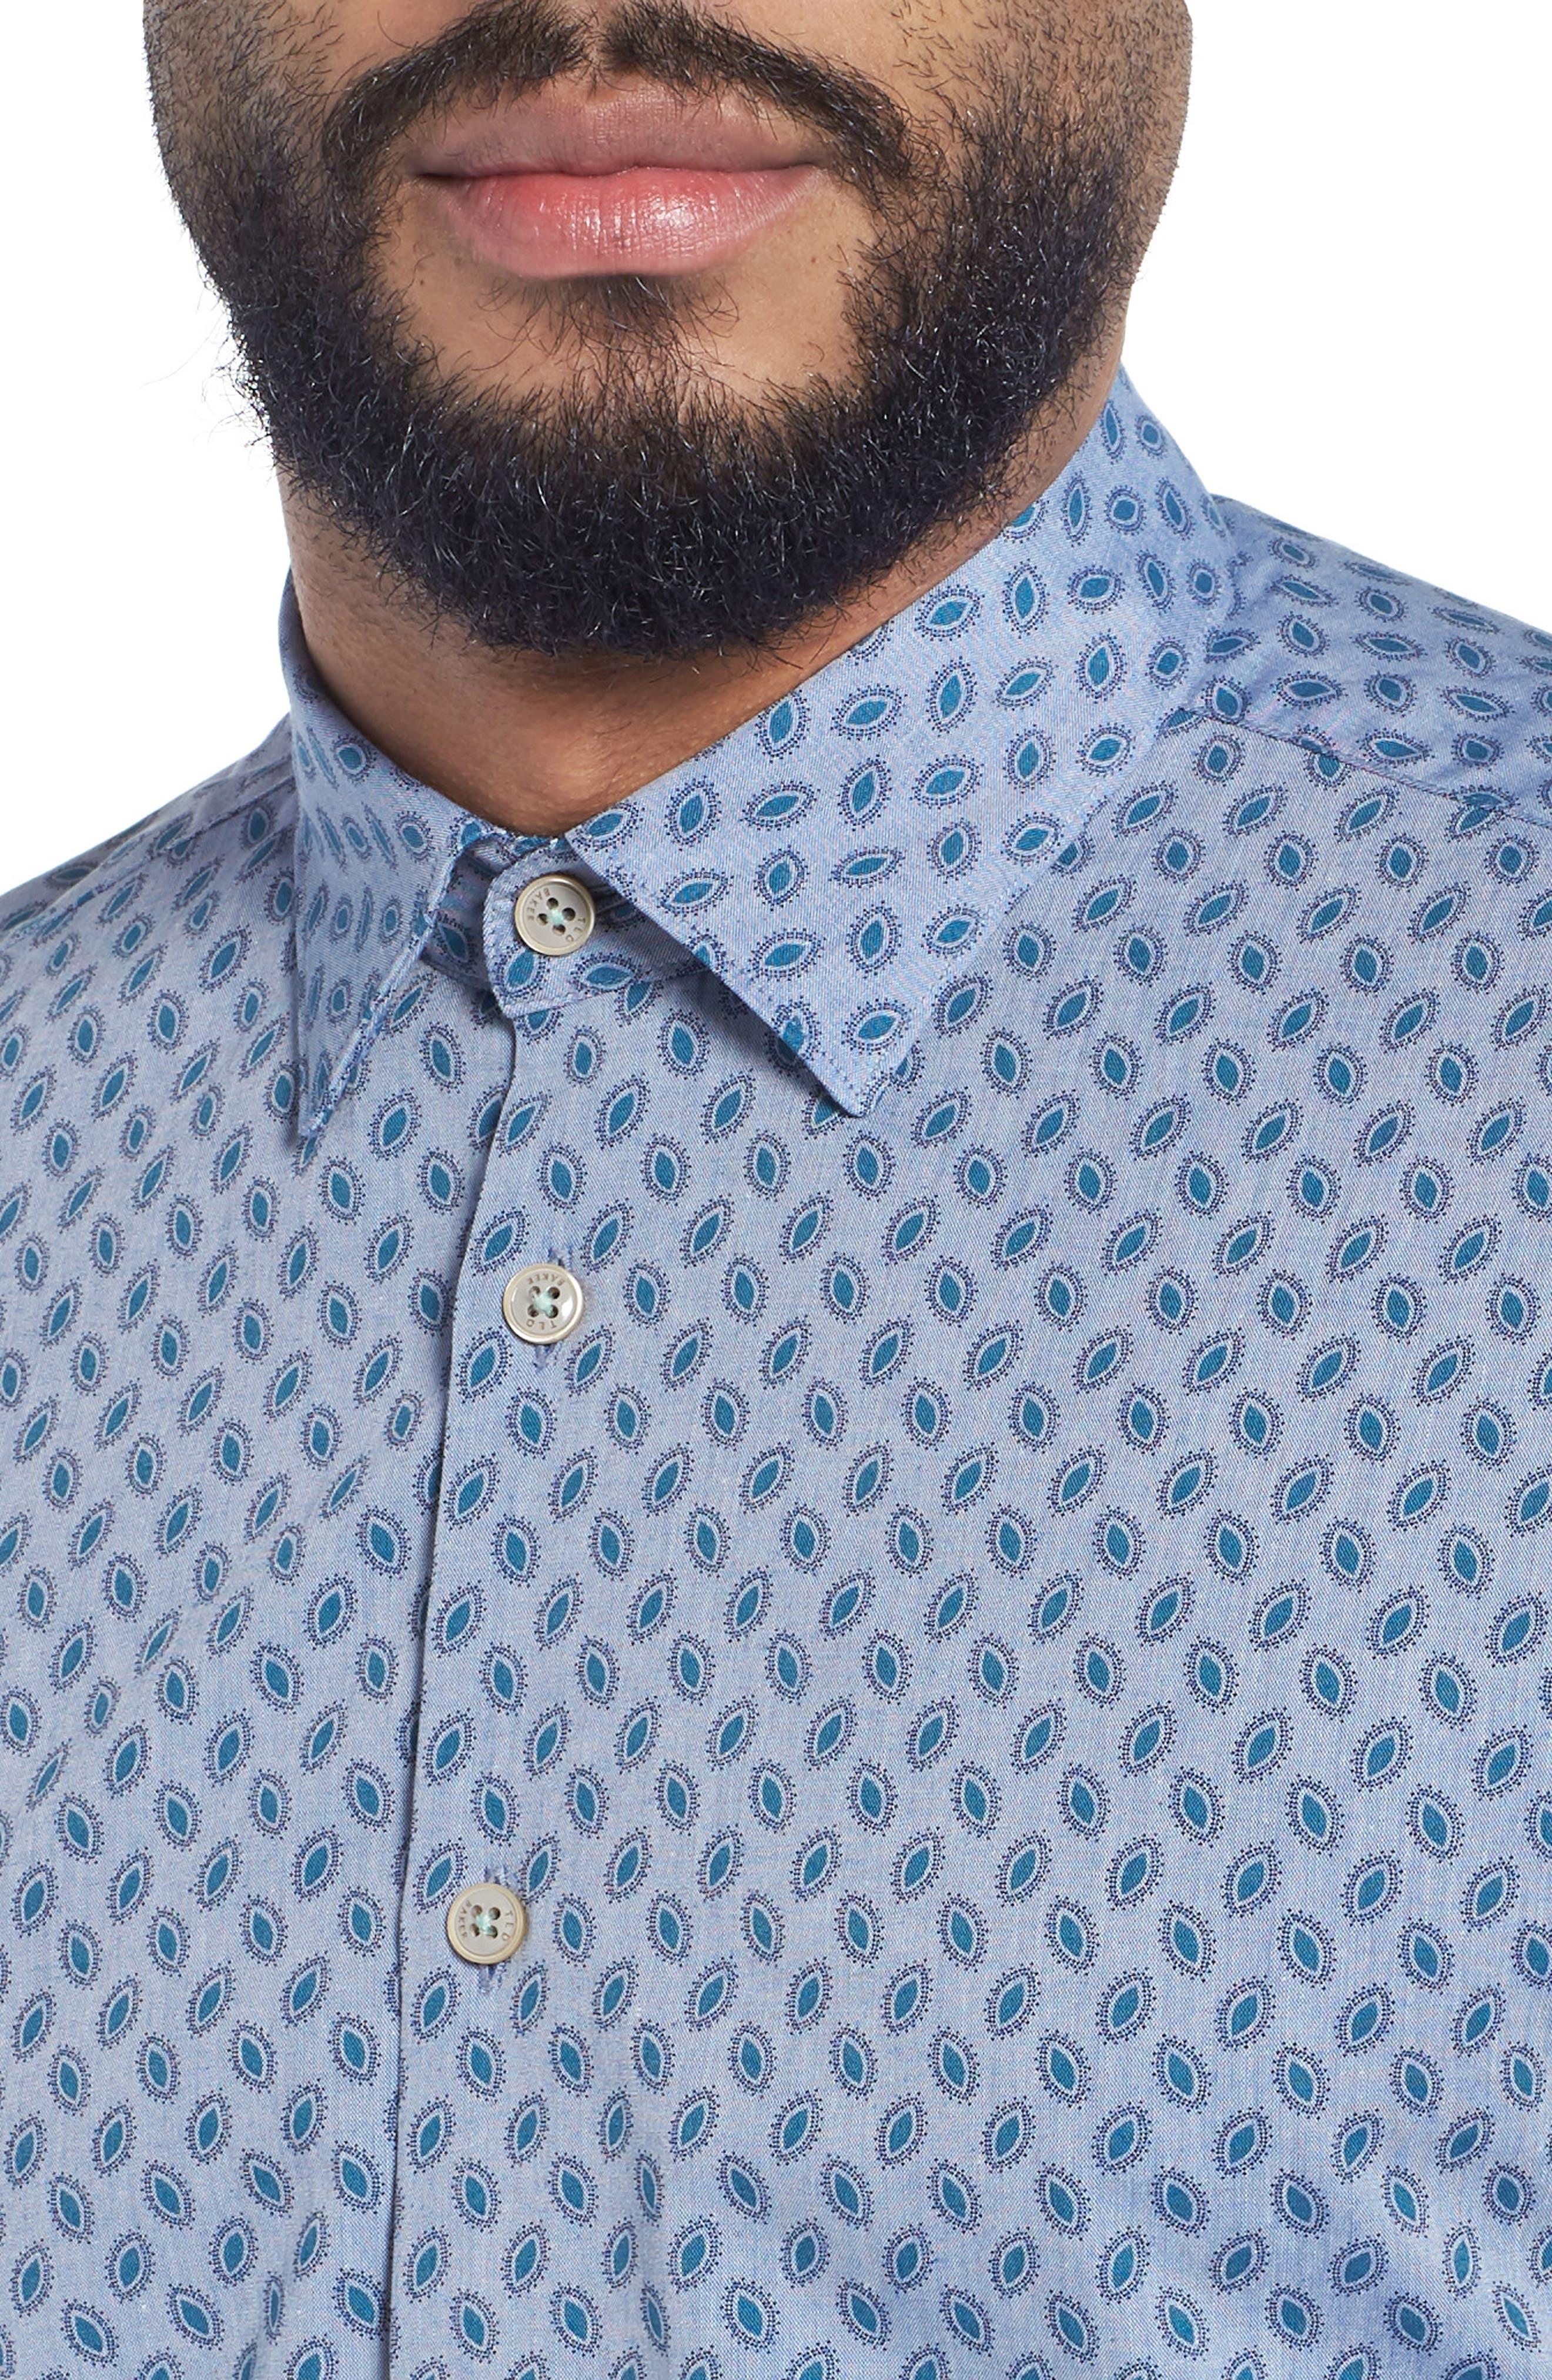 Newfott Extra Slim Fit Short Sleeve Sport Shirt,                             Alternate thumbnail 2, color,                             Blue